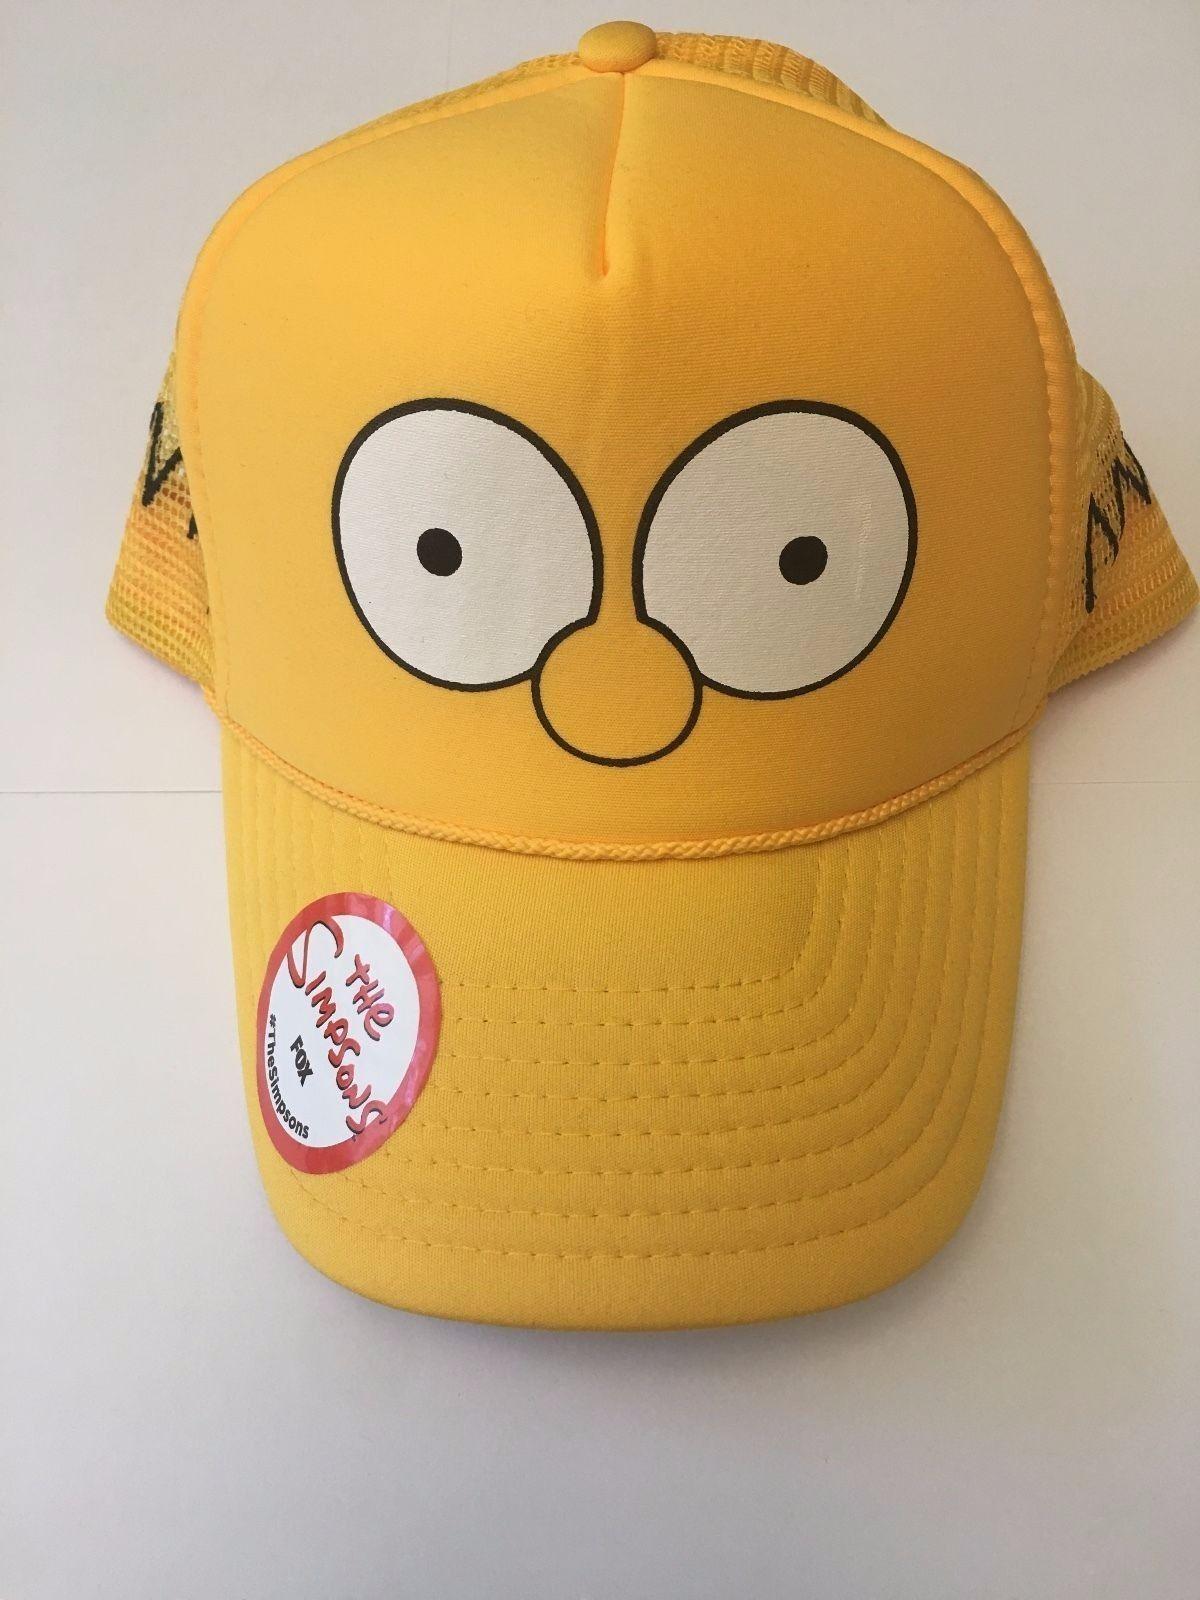 760fe040baa85 SDCC 2017 Exclusive Homer Simpson Trucker SnapBack Hat Comic Con FOX  Special !